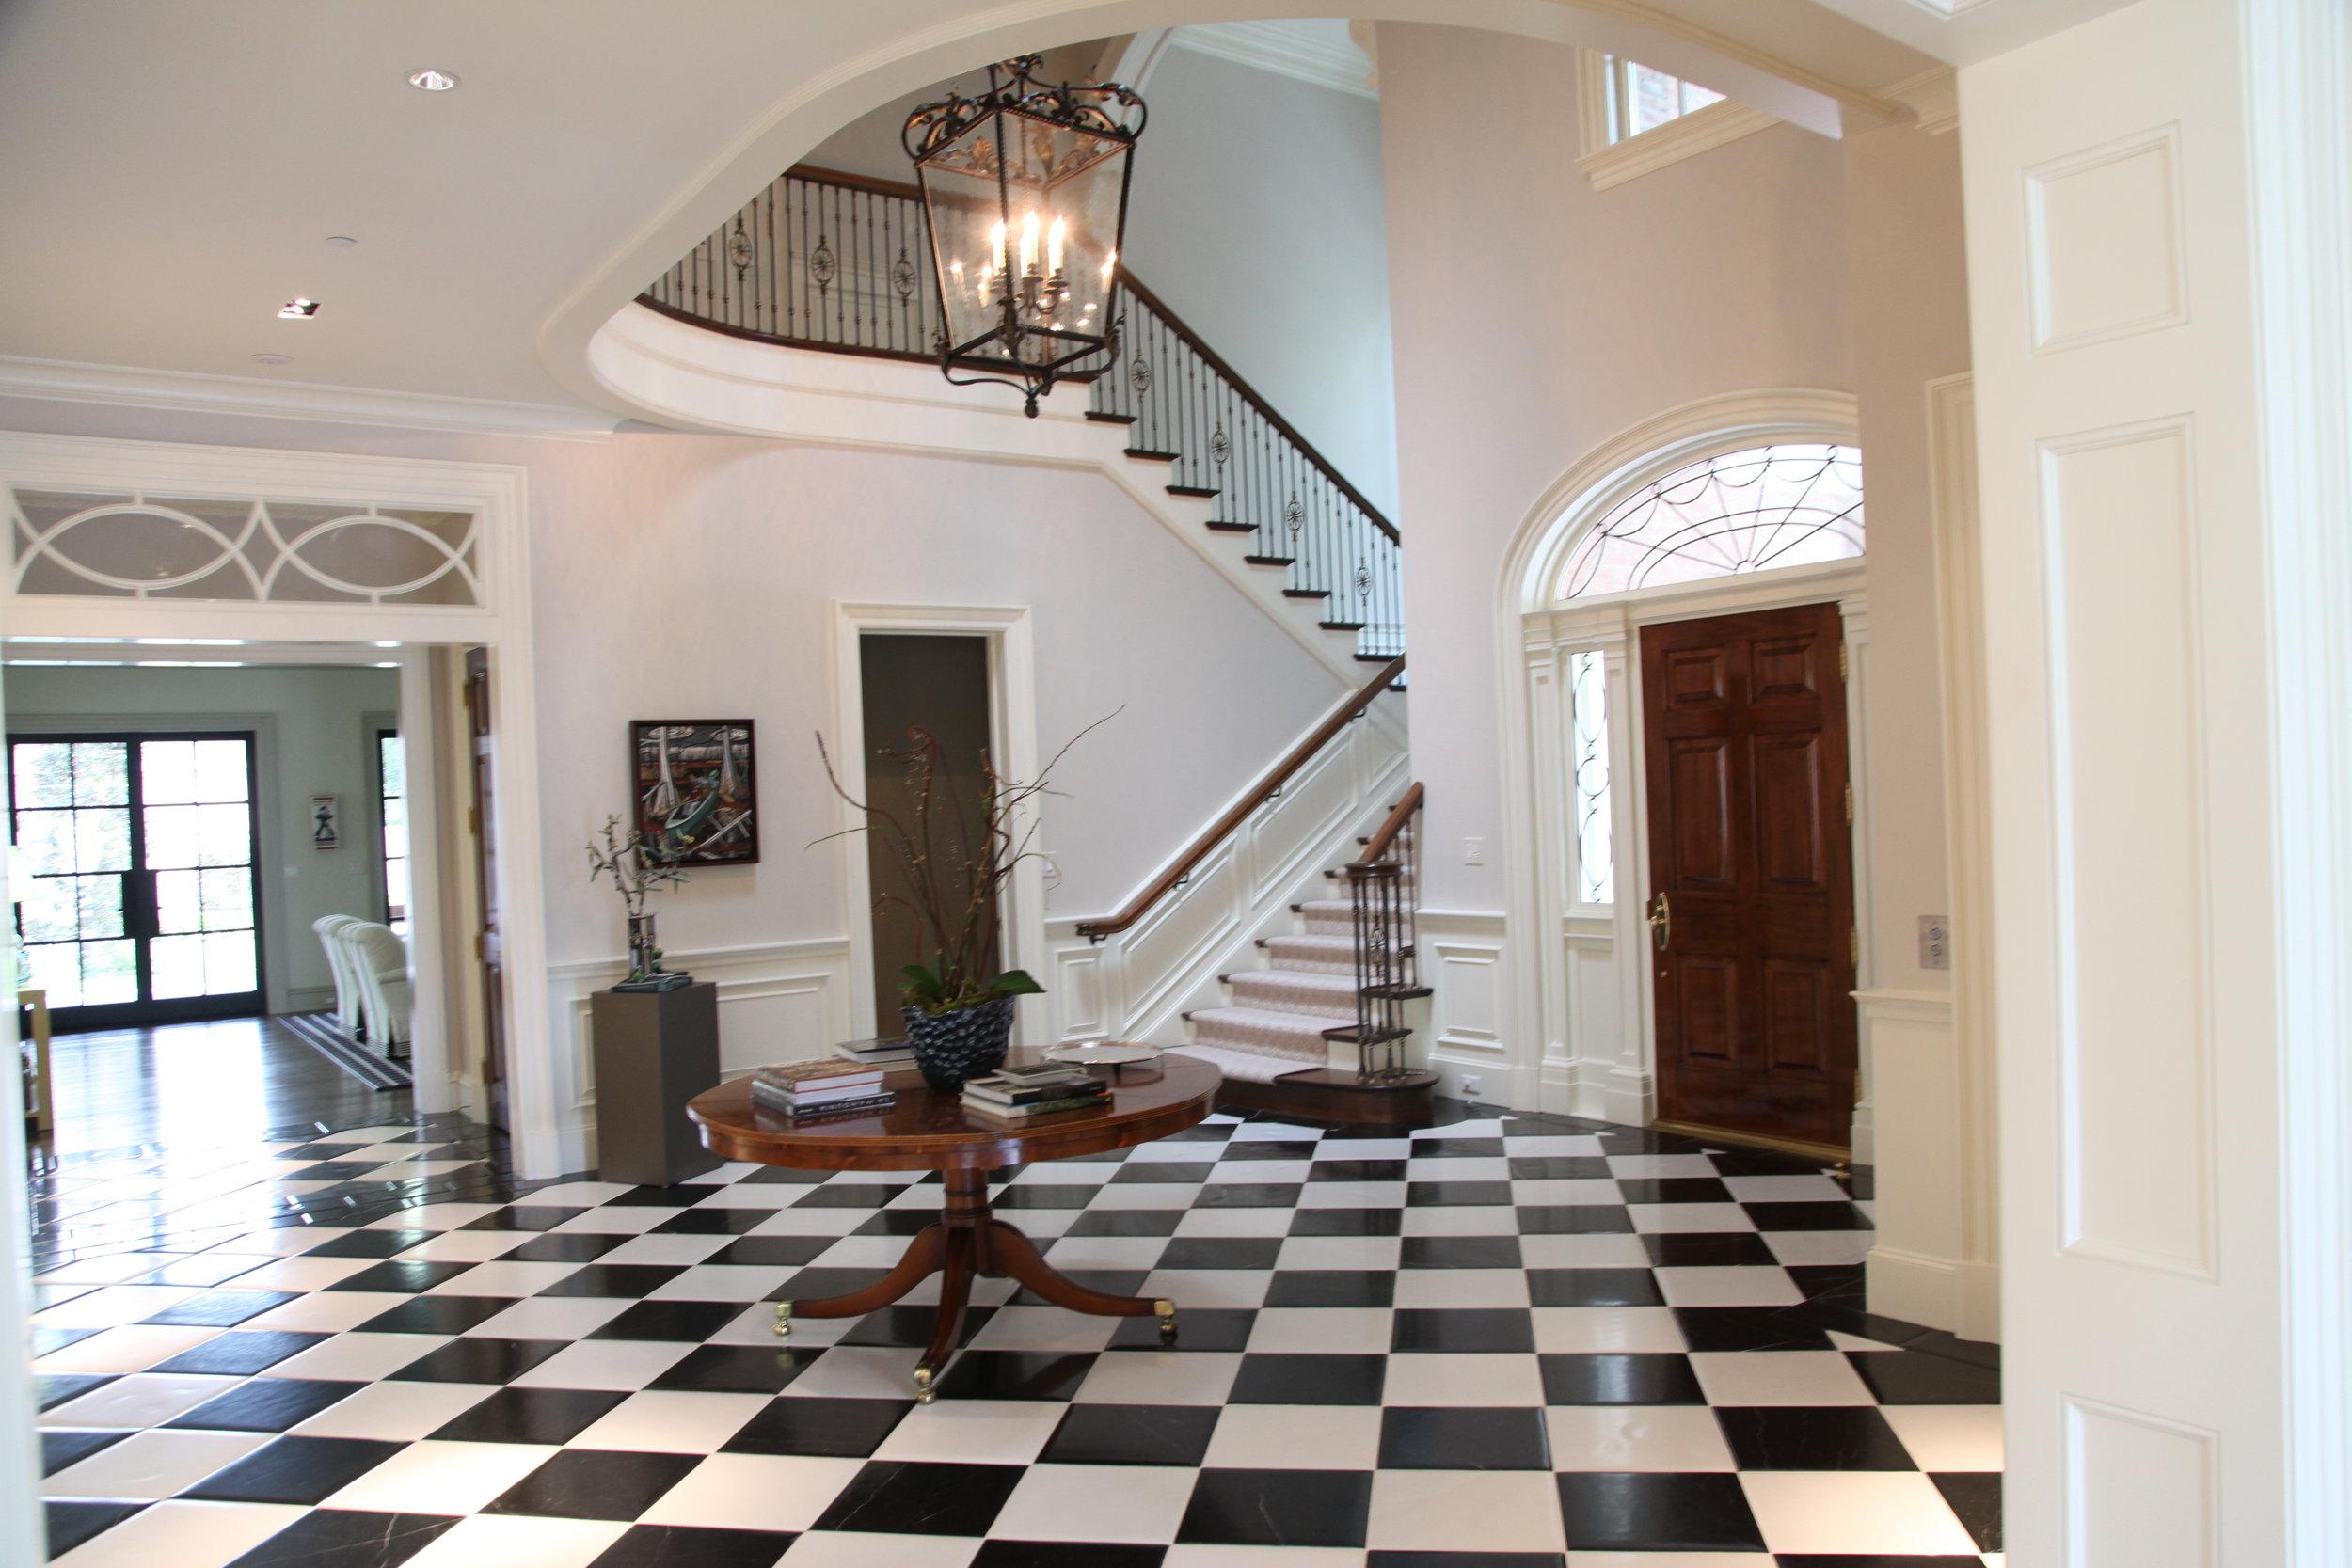 Interiors (1).JPG